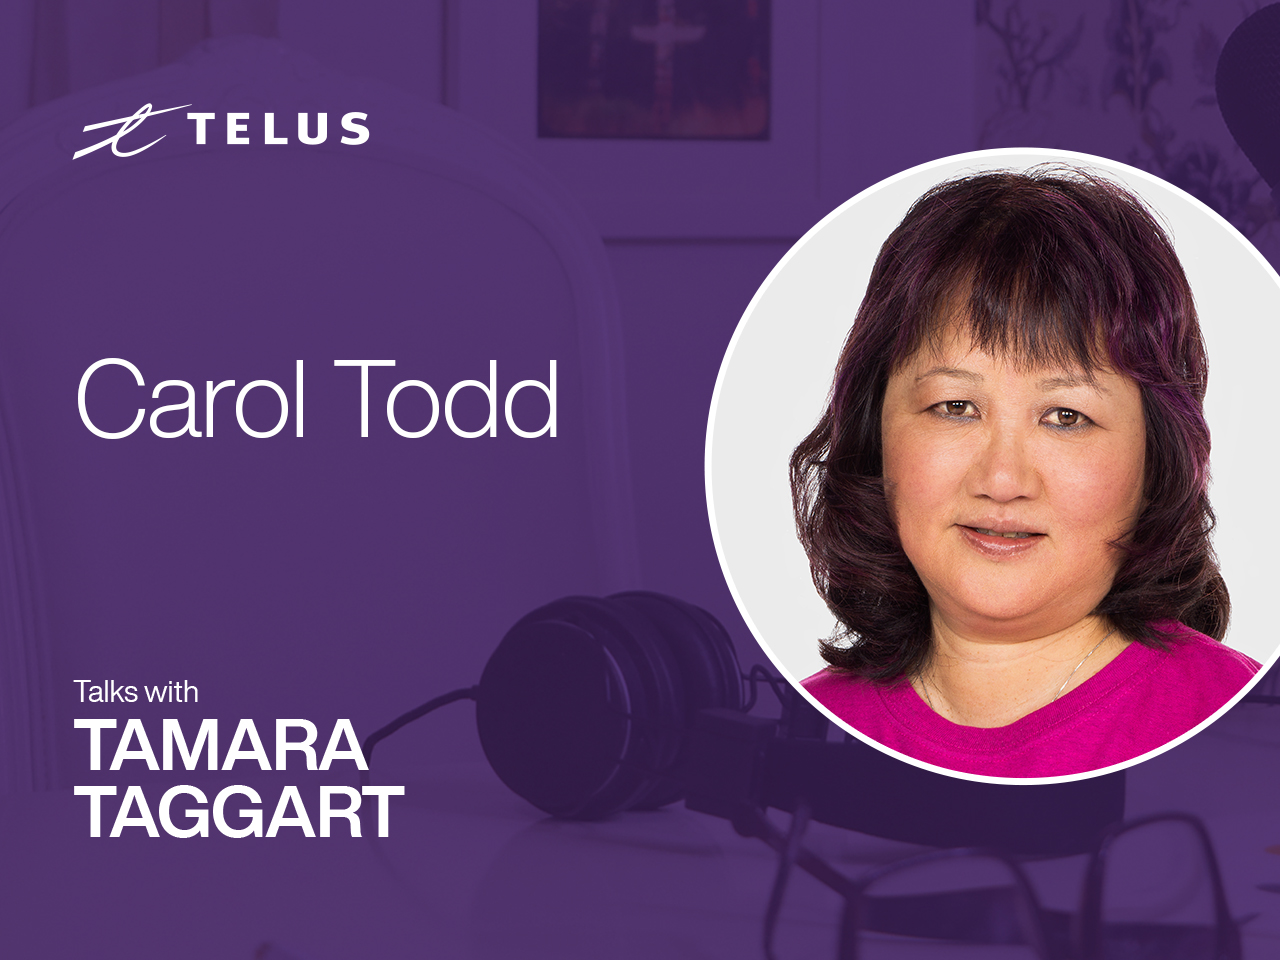 Anti-bullying advocate Carol Todd